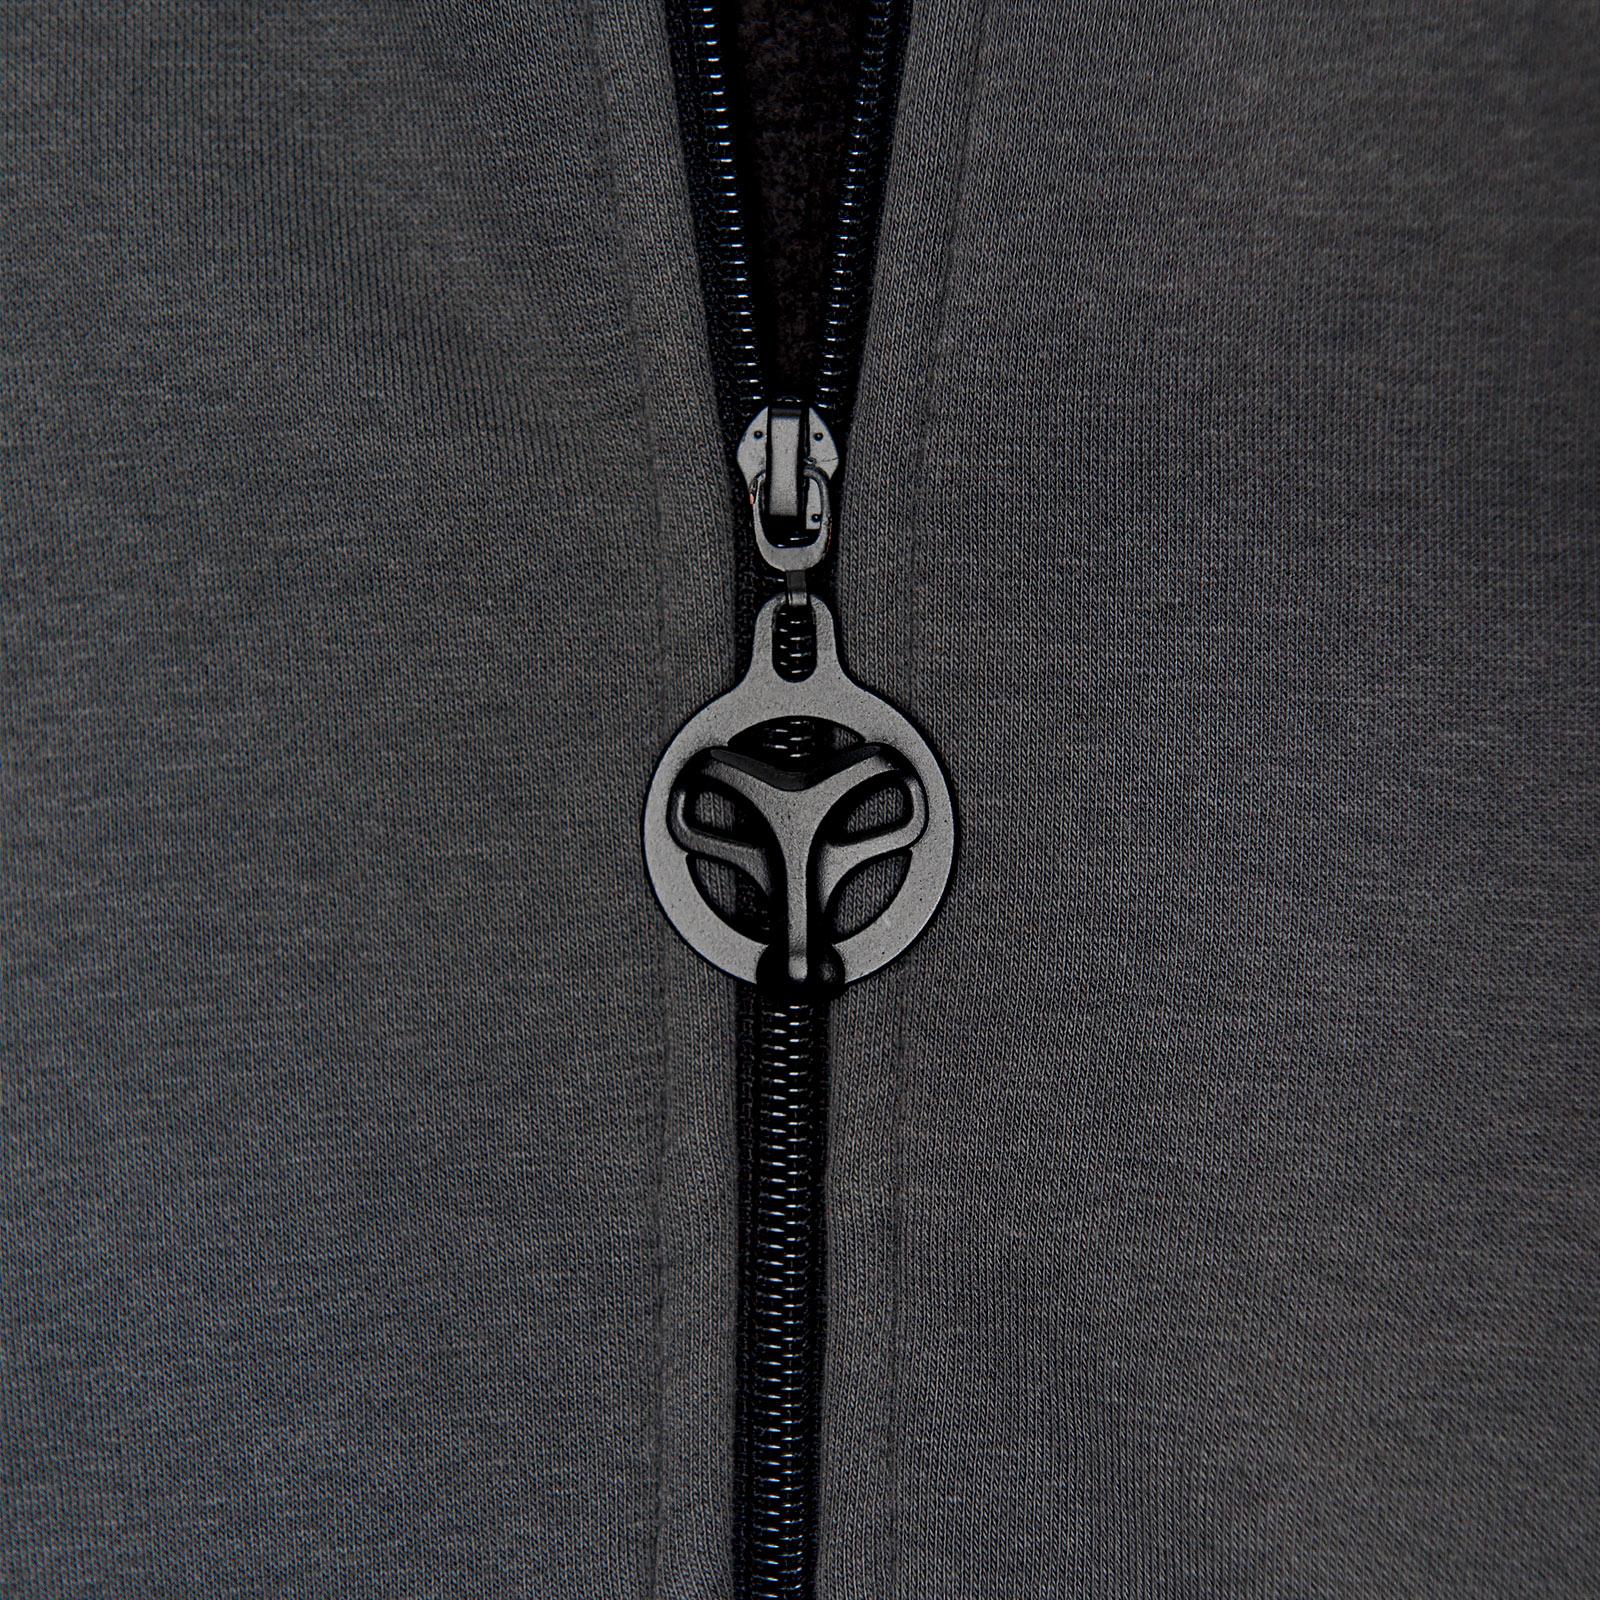 Overwatch - Phantom Reaper Kapuzenjacke